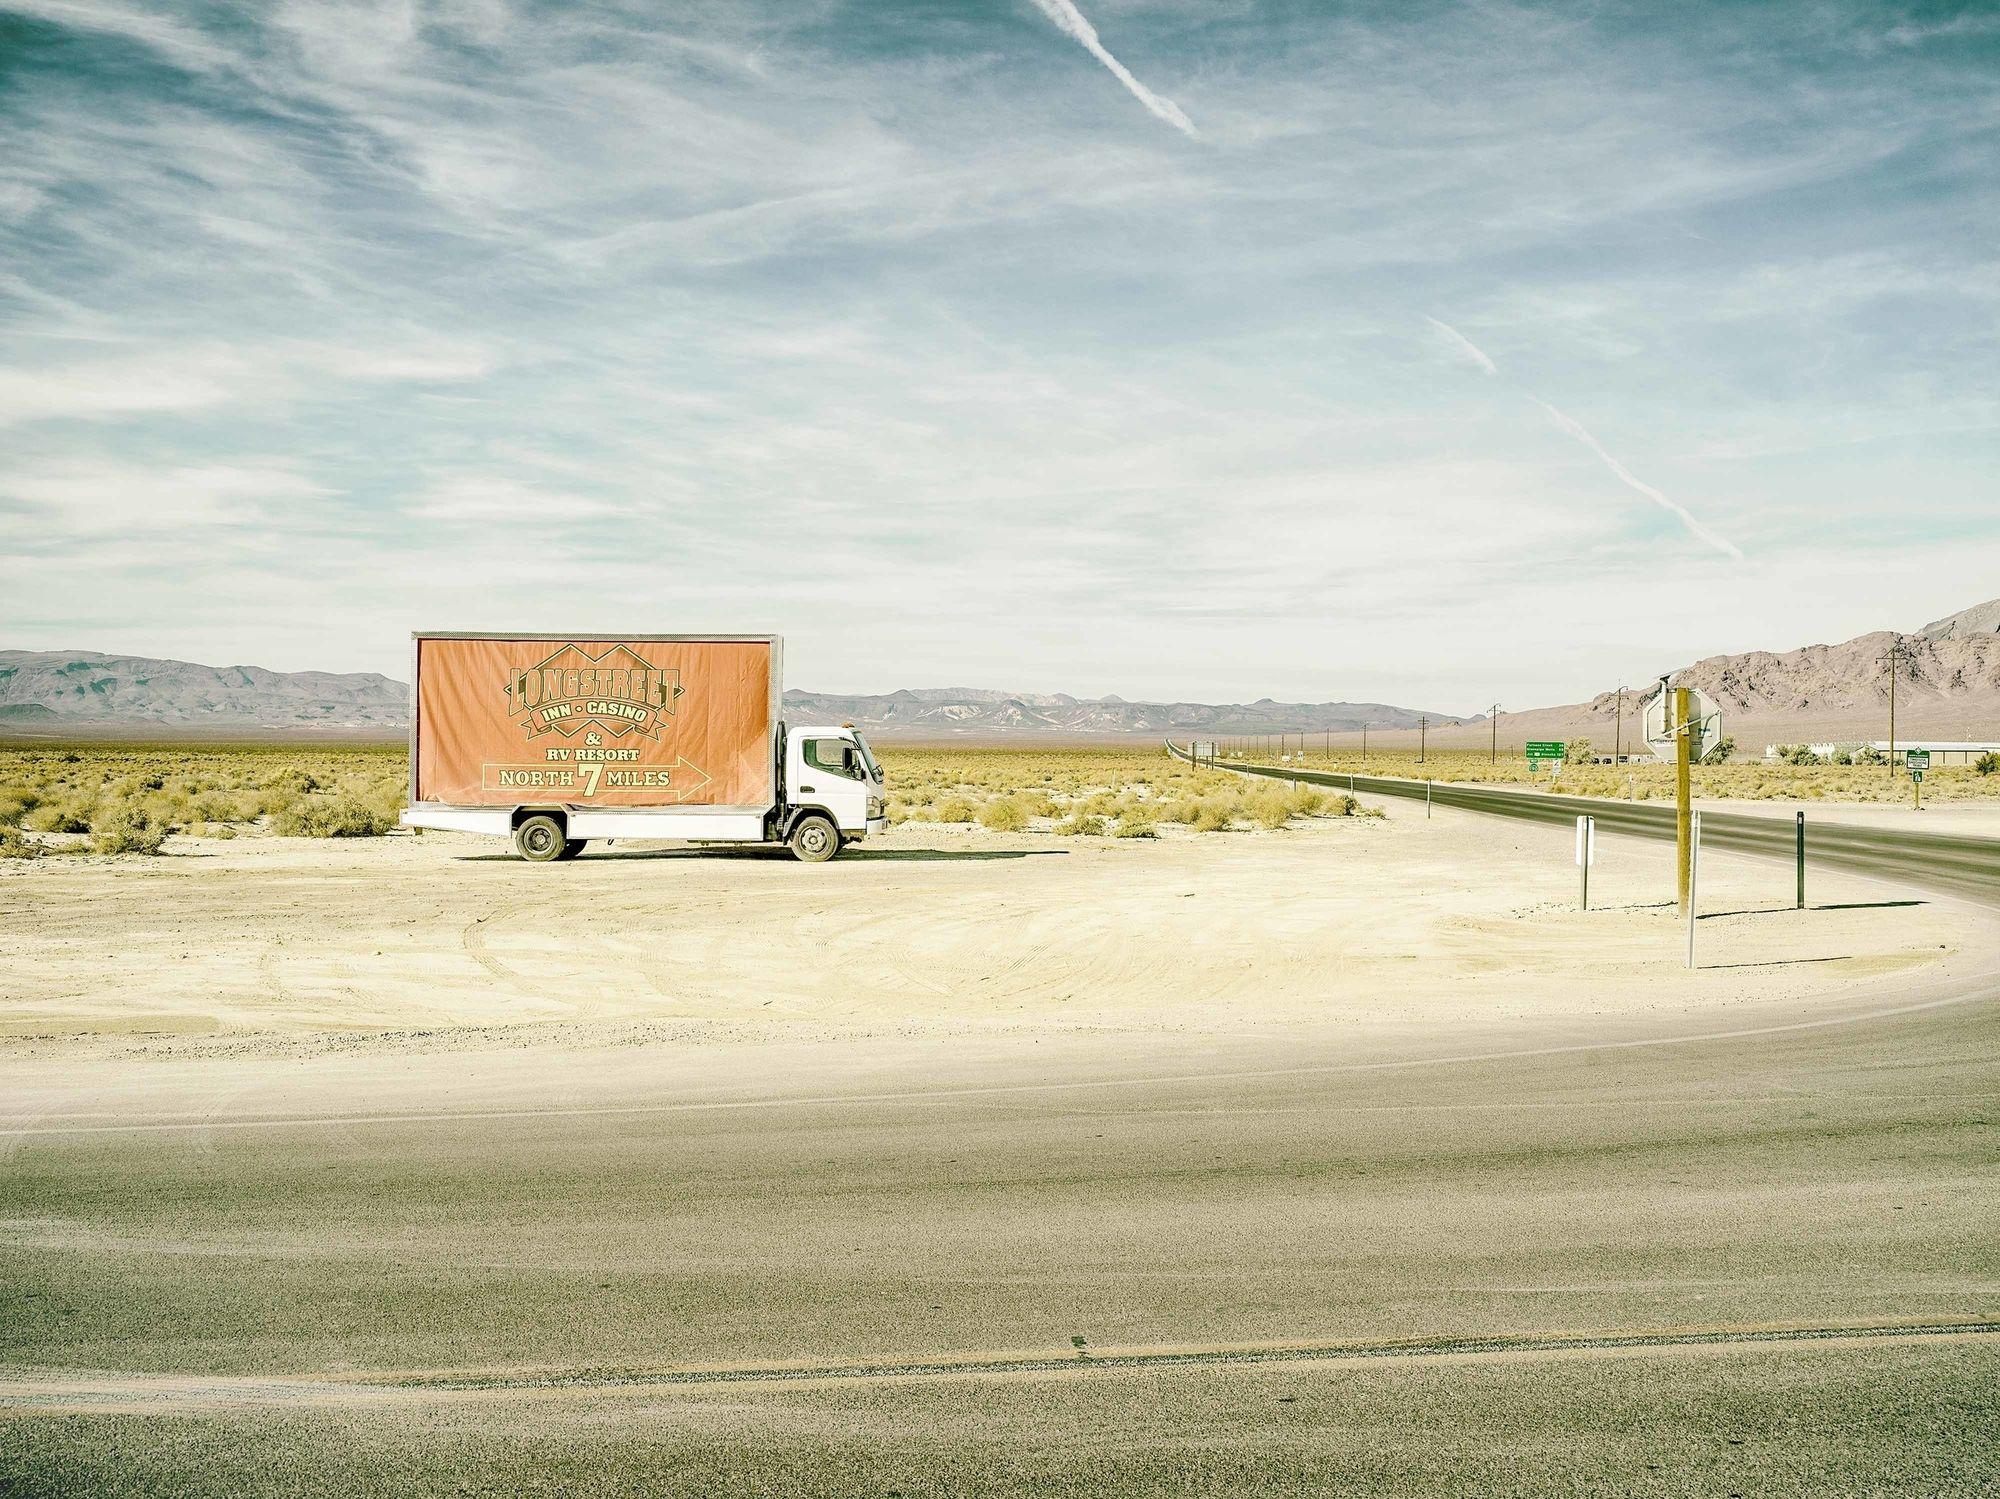 WE! SHOOT IT, American Southwest, by Thomas von Salomon & Michael Compensis